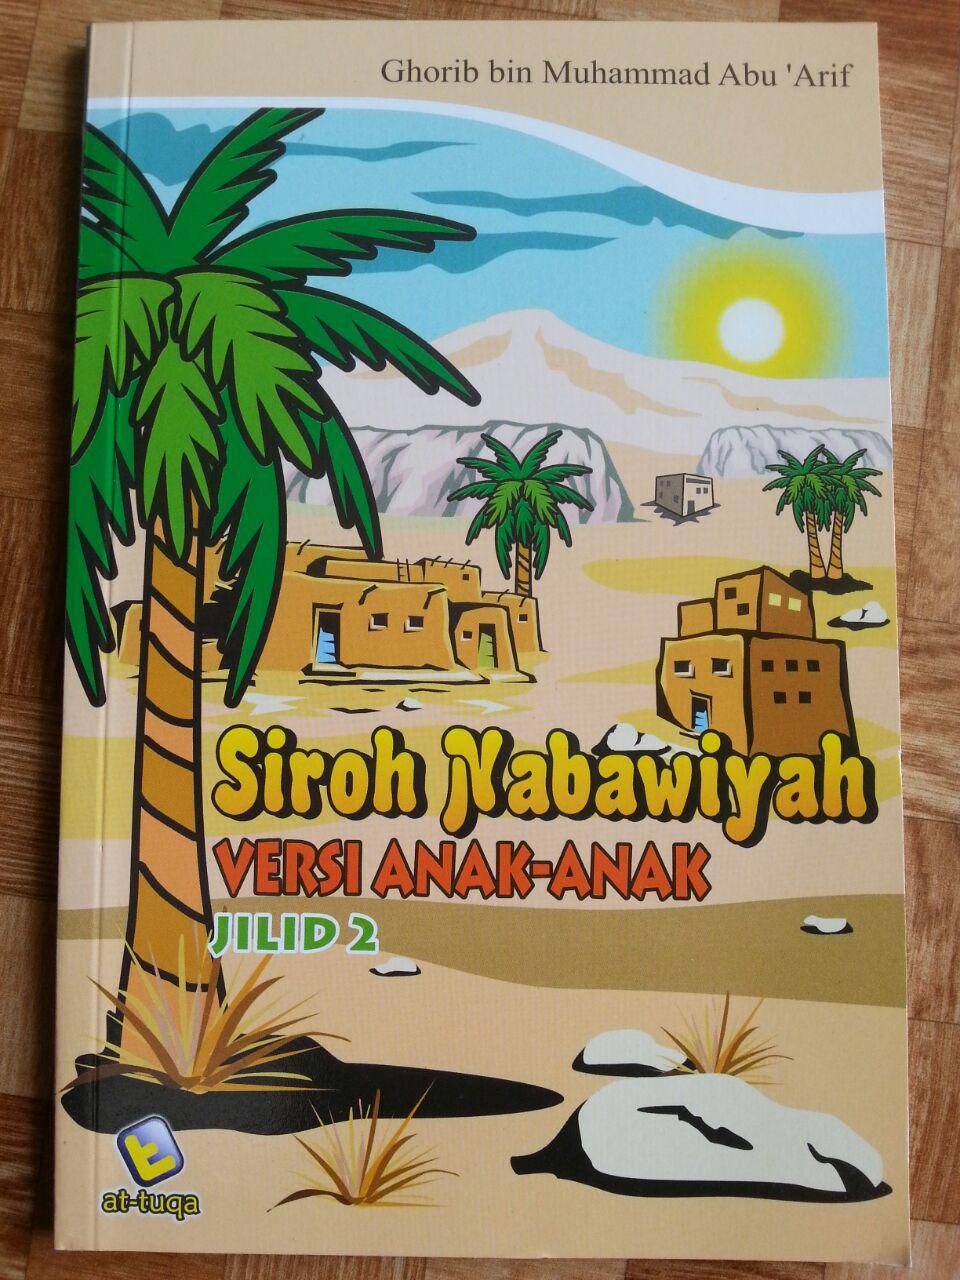 Buku Siroh Nabawiyah Versi Anak-Anak Jilid 2 cover 2